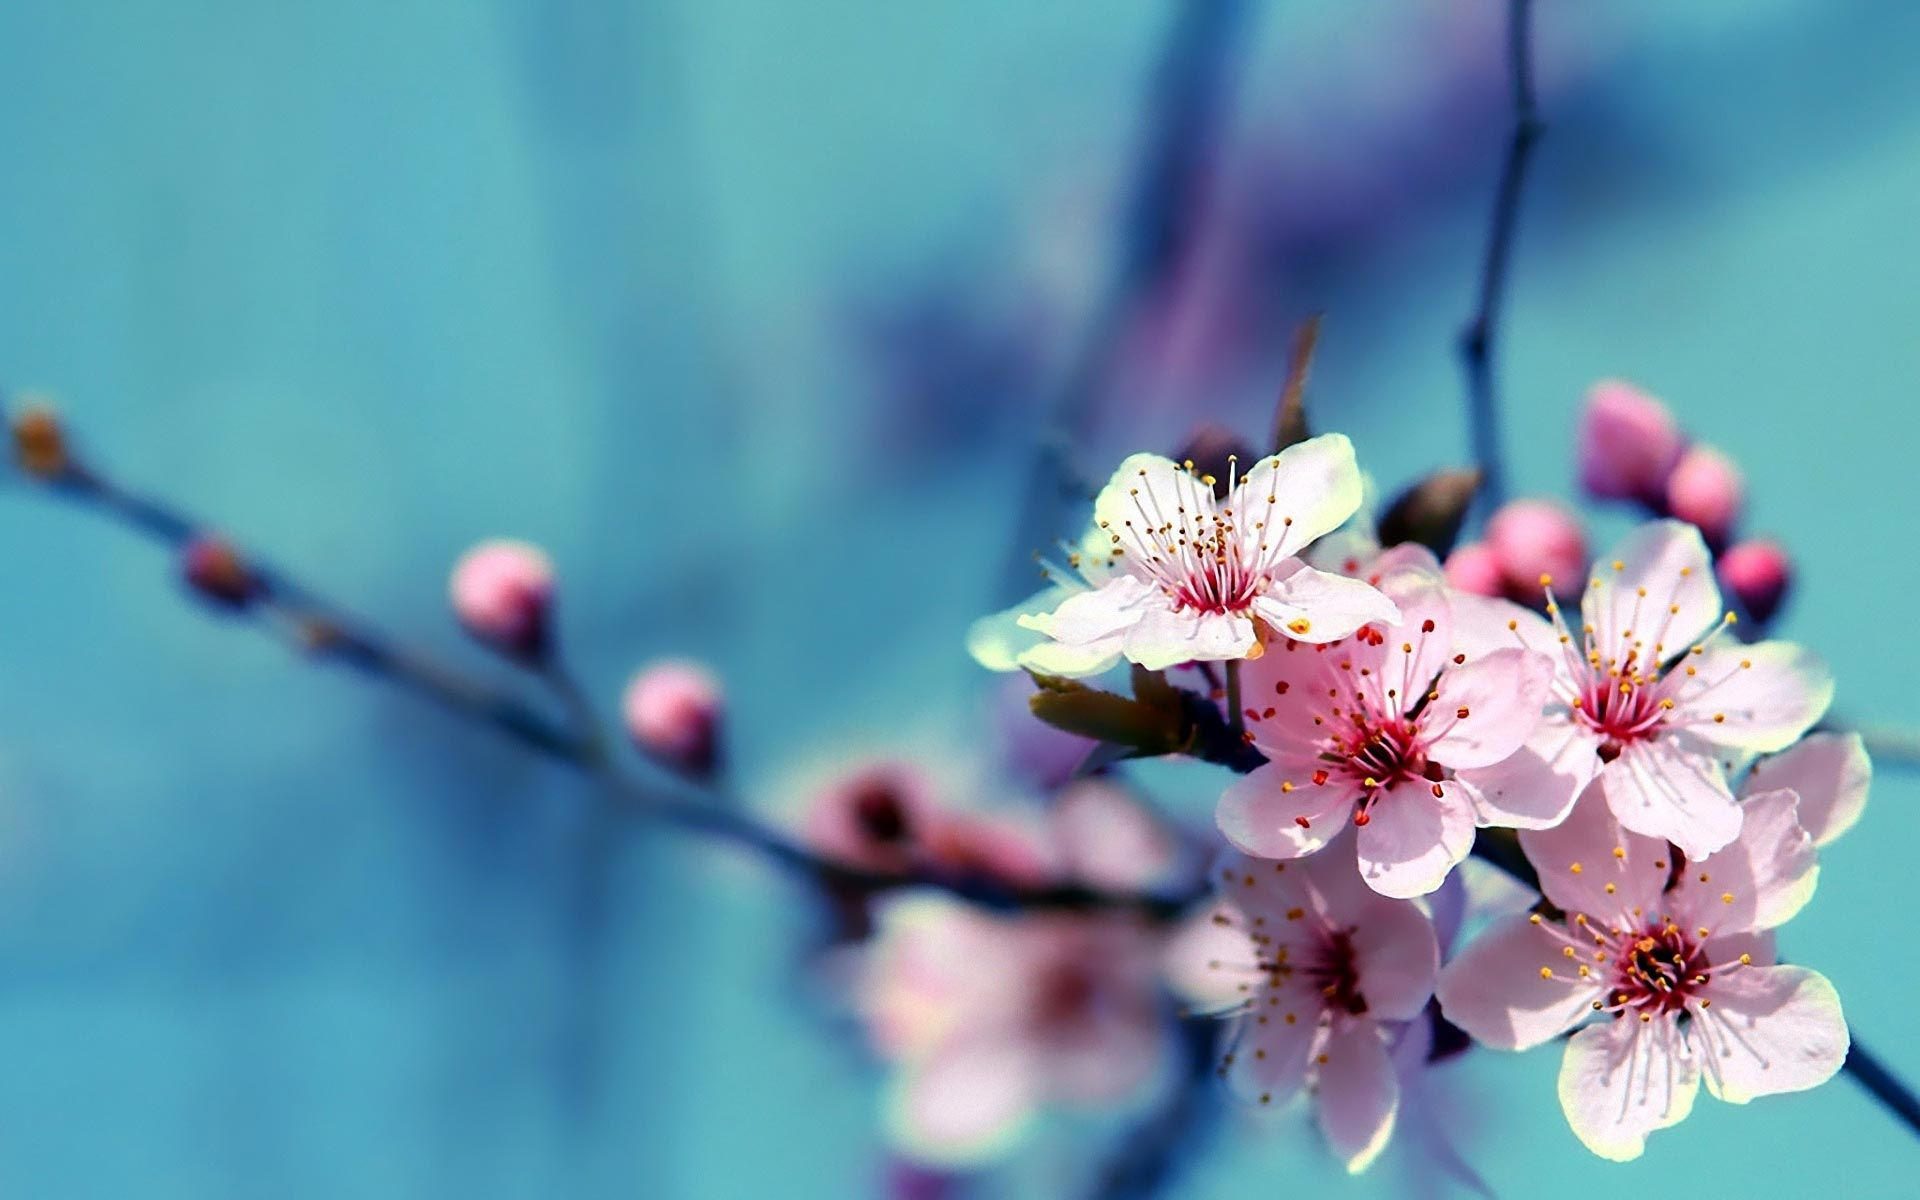 Pc Wallpaper Hd 1080p Flower Hd flowers wal 1920x1200